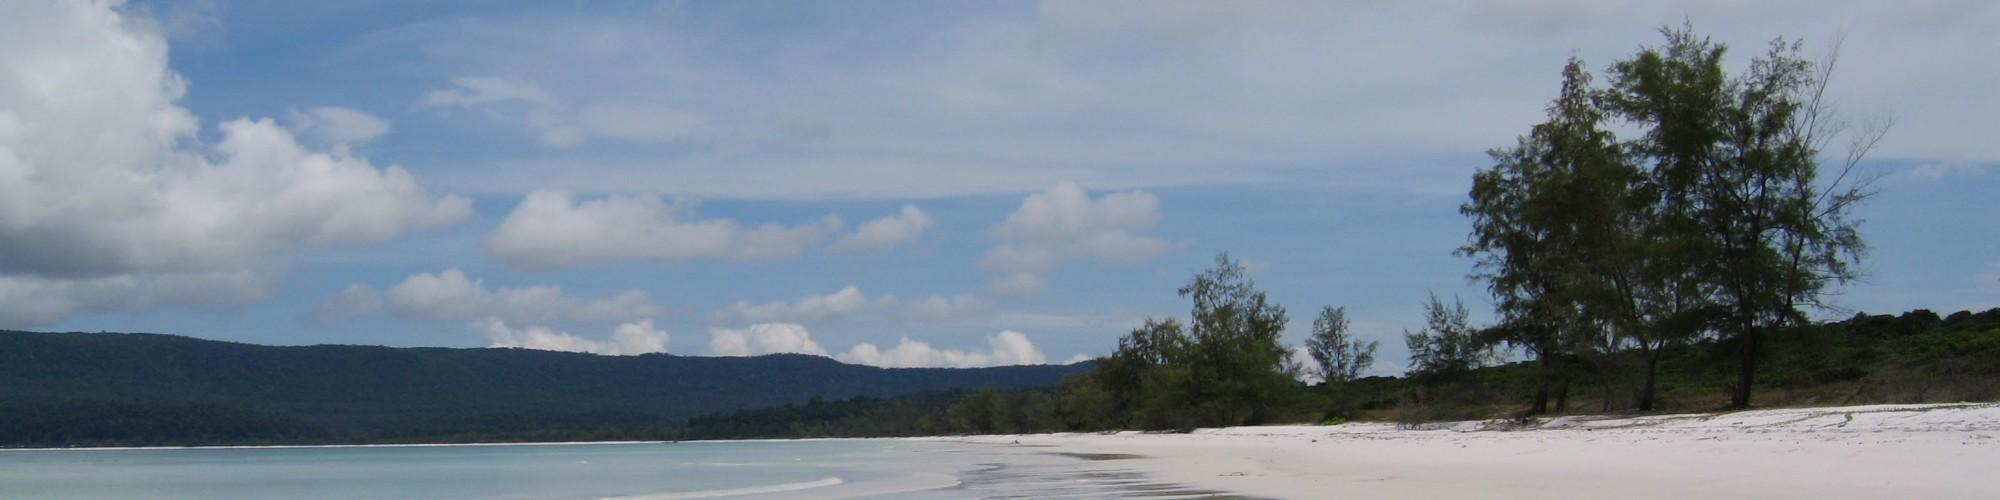 Koh Rong Samloem Island_Pristine beach resort_Sihanoukville_Cambodia (3)